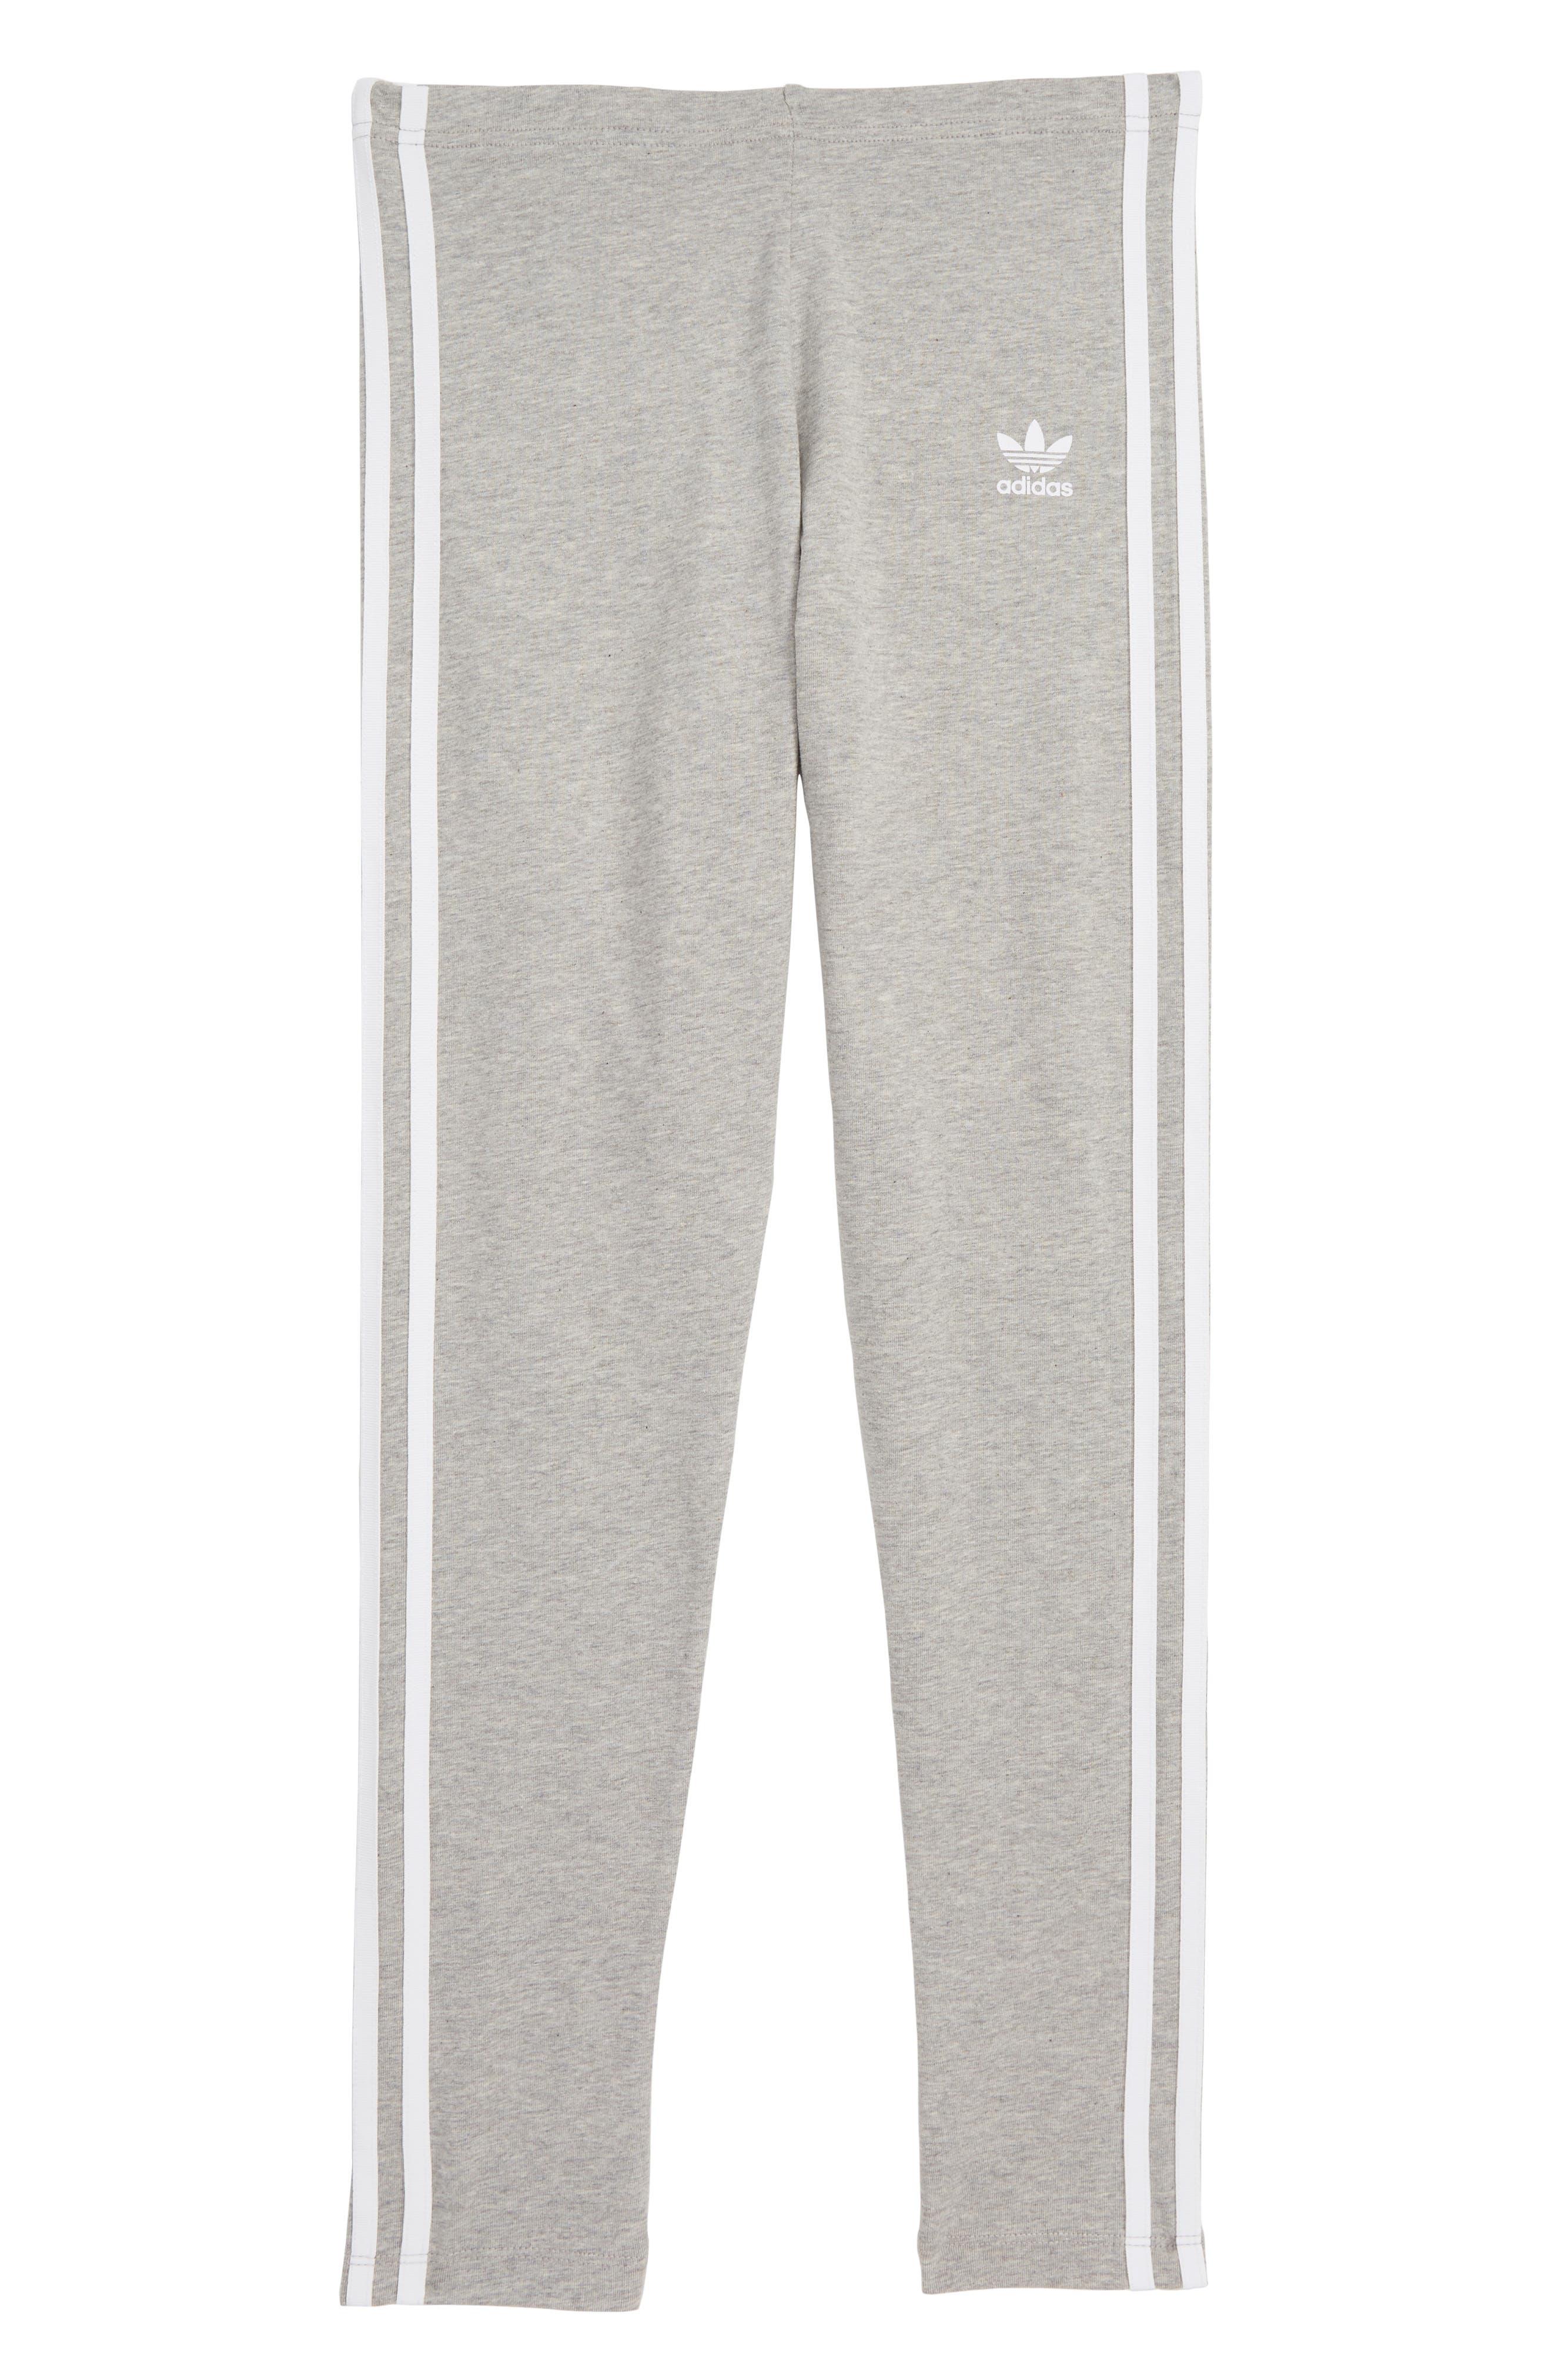 ADIDAS ORIGINALS adidas 3-Stripes Leggings, Main, color, 035